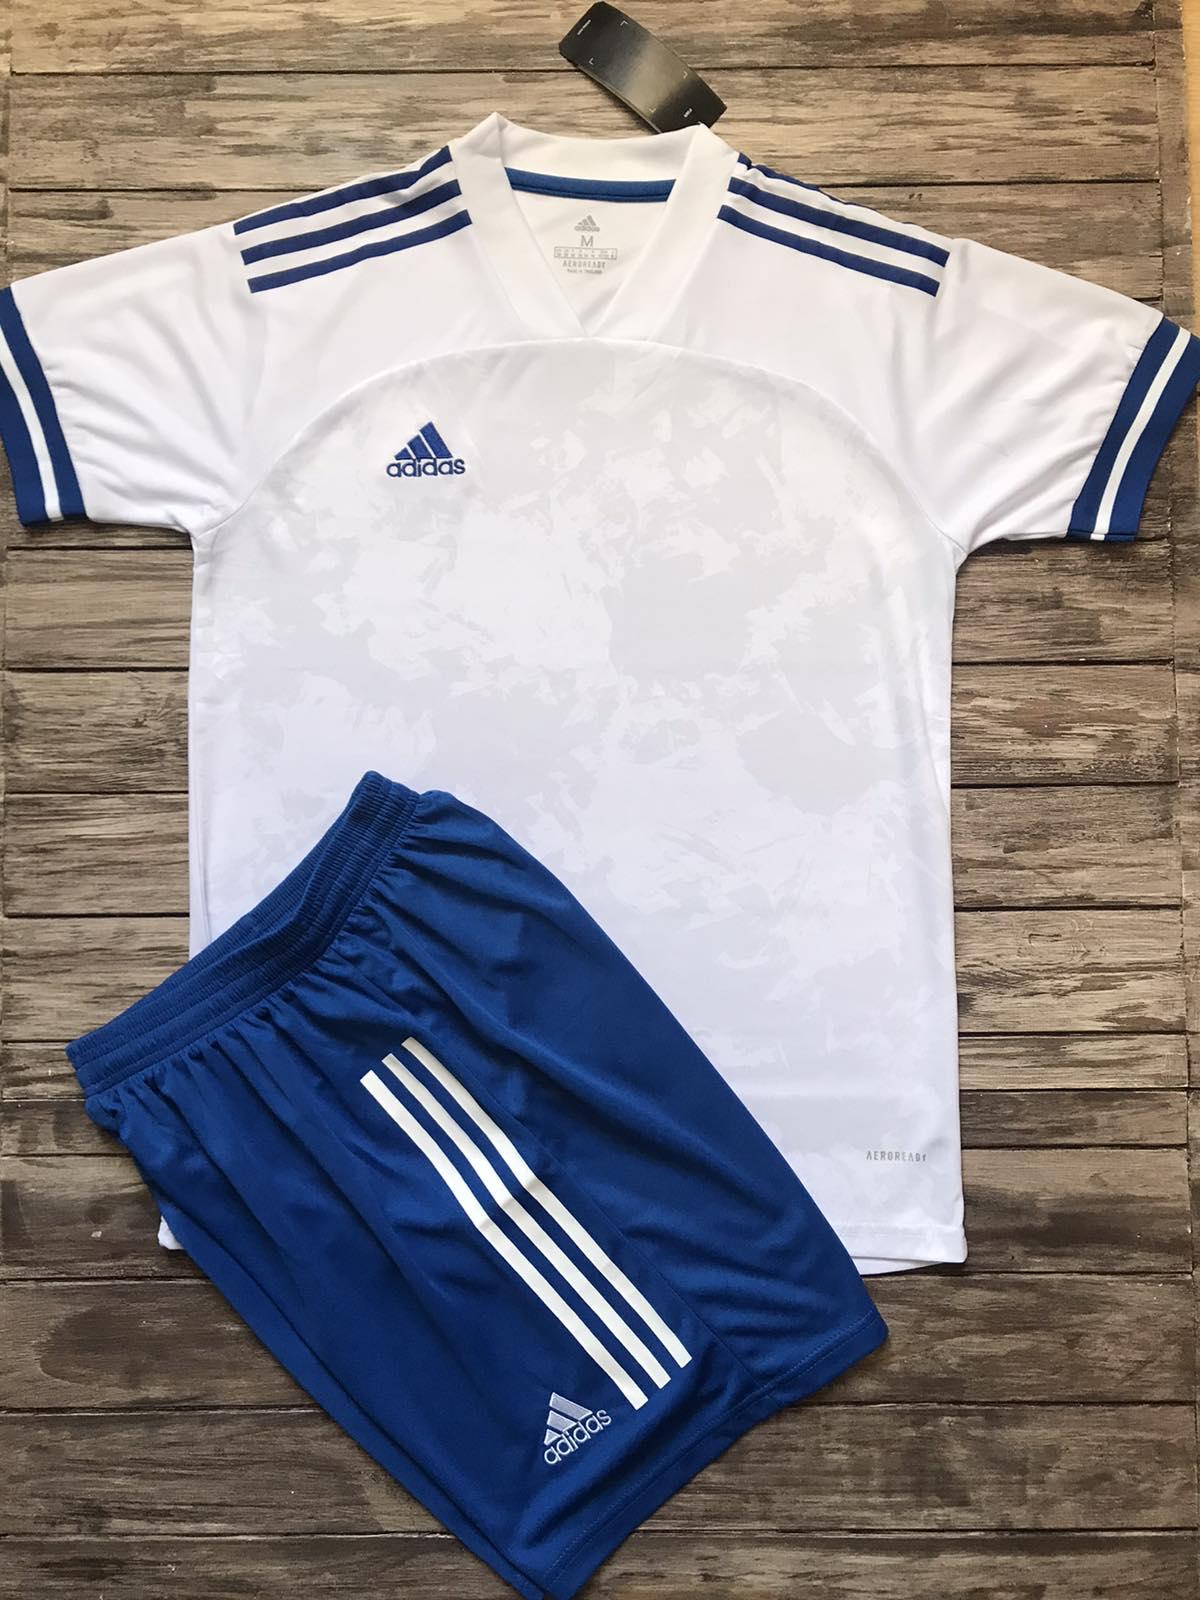 Футбольная форма Adidas 2021 белая